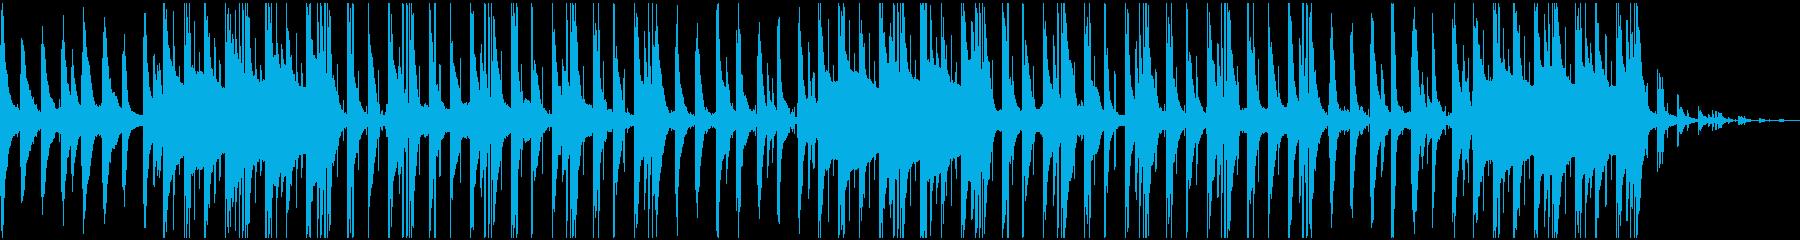 vlog Lofi hiphopなビートの再生済みの波形